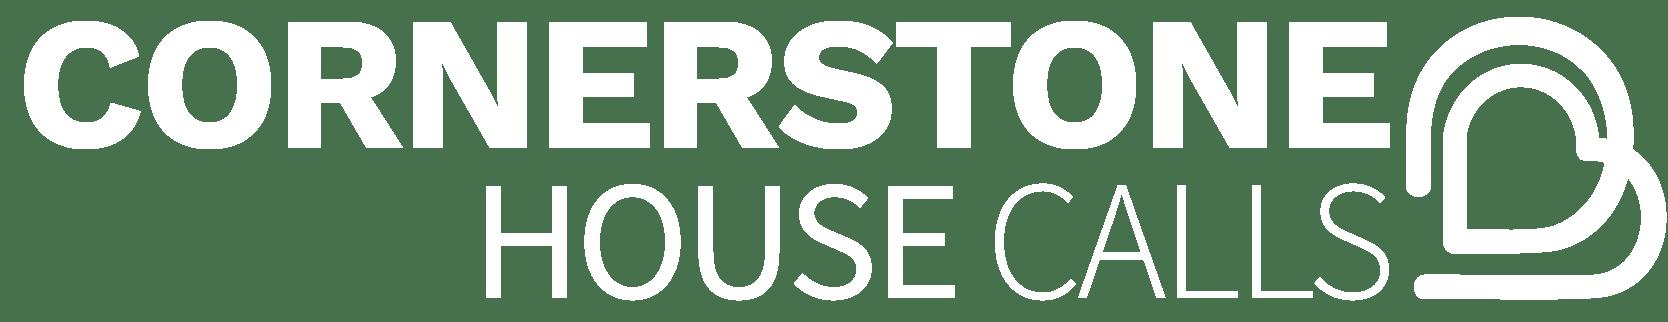 Cornerstone Logo Only_Artboard 2